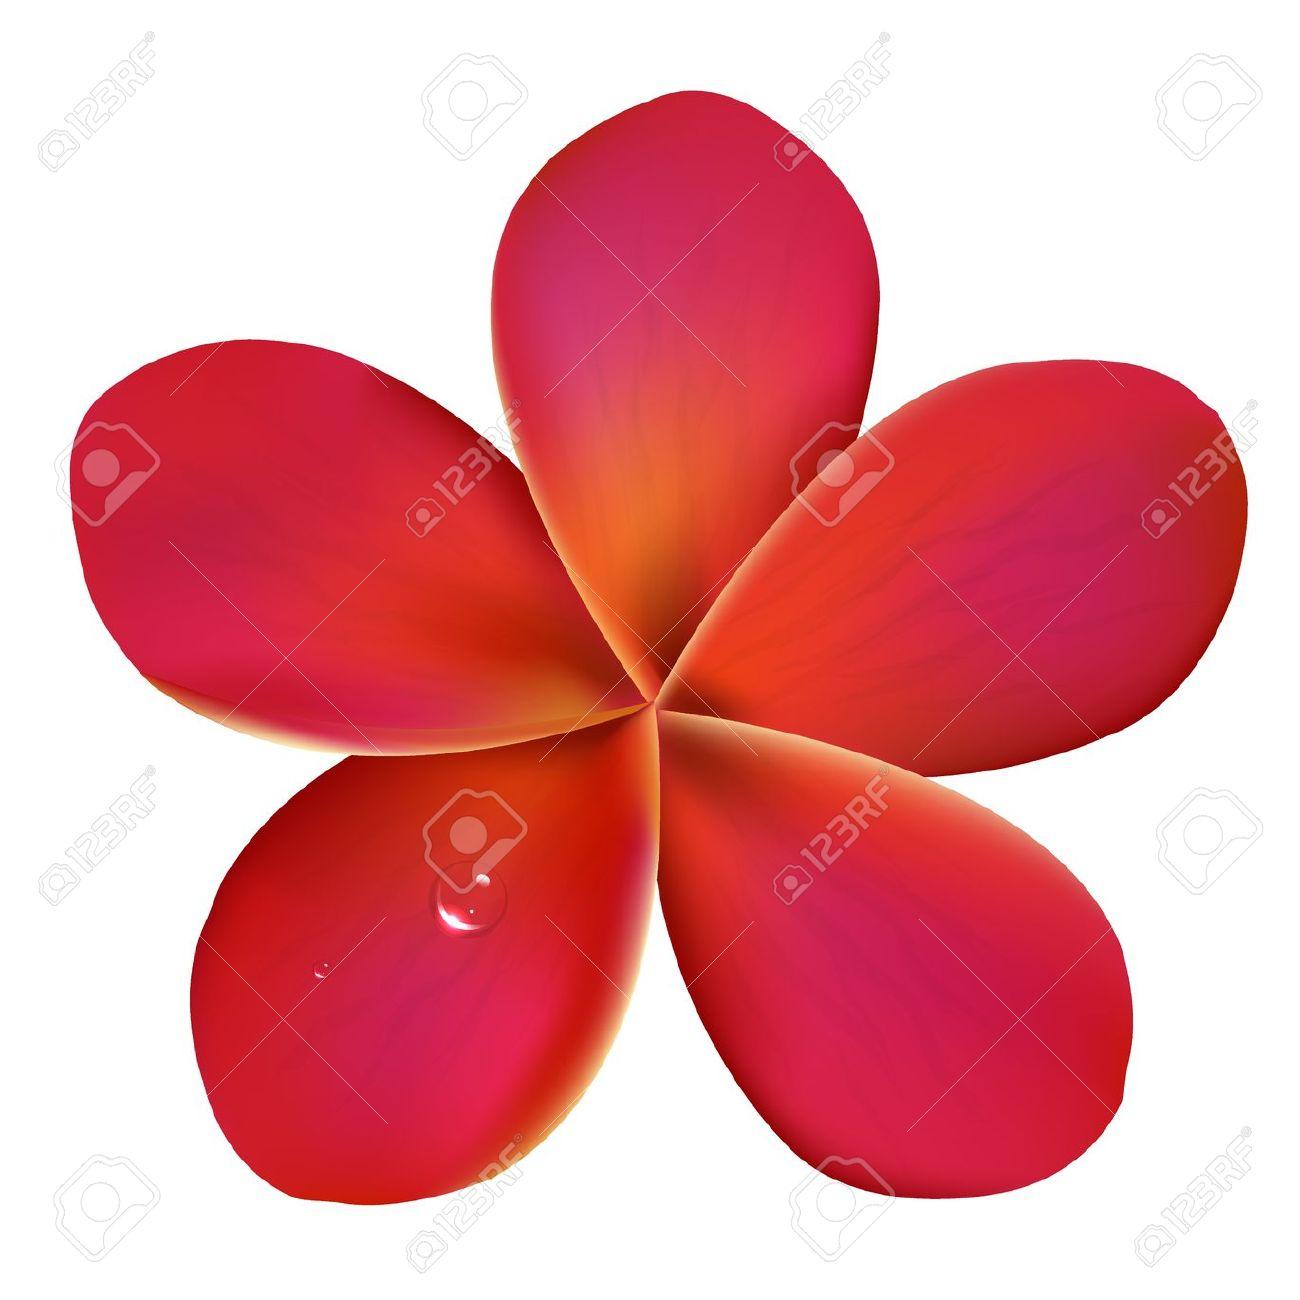 Pink Flower clipart plumeria Plumeria  Isolated Clipart Background